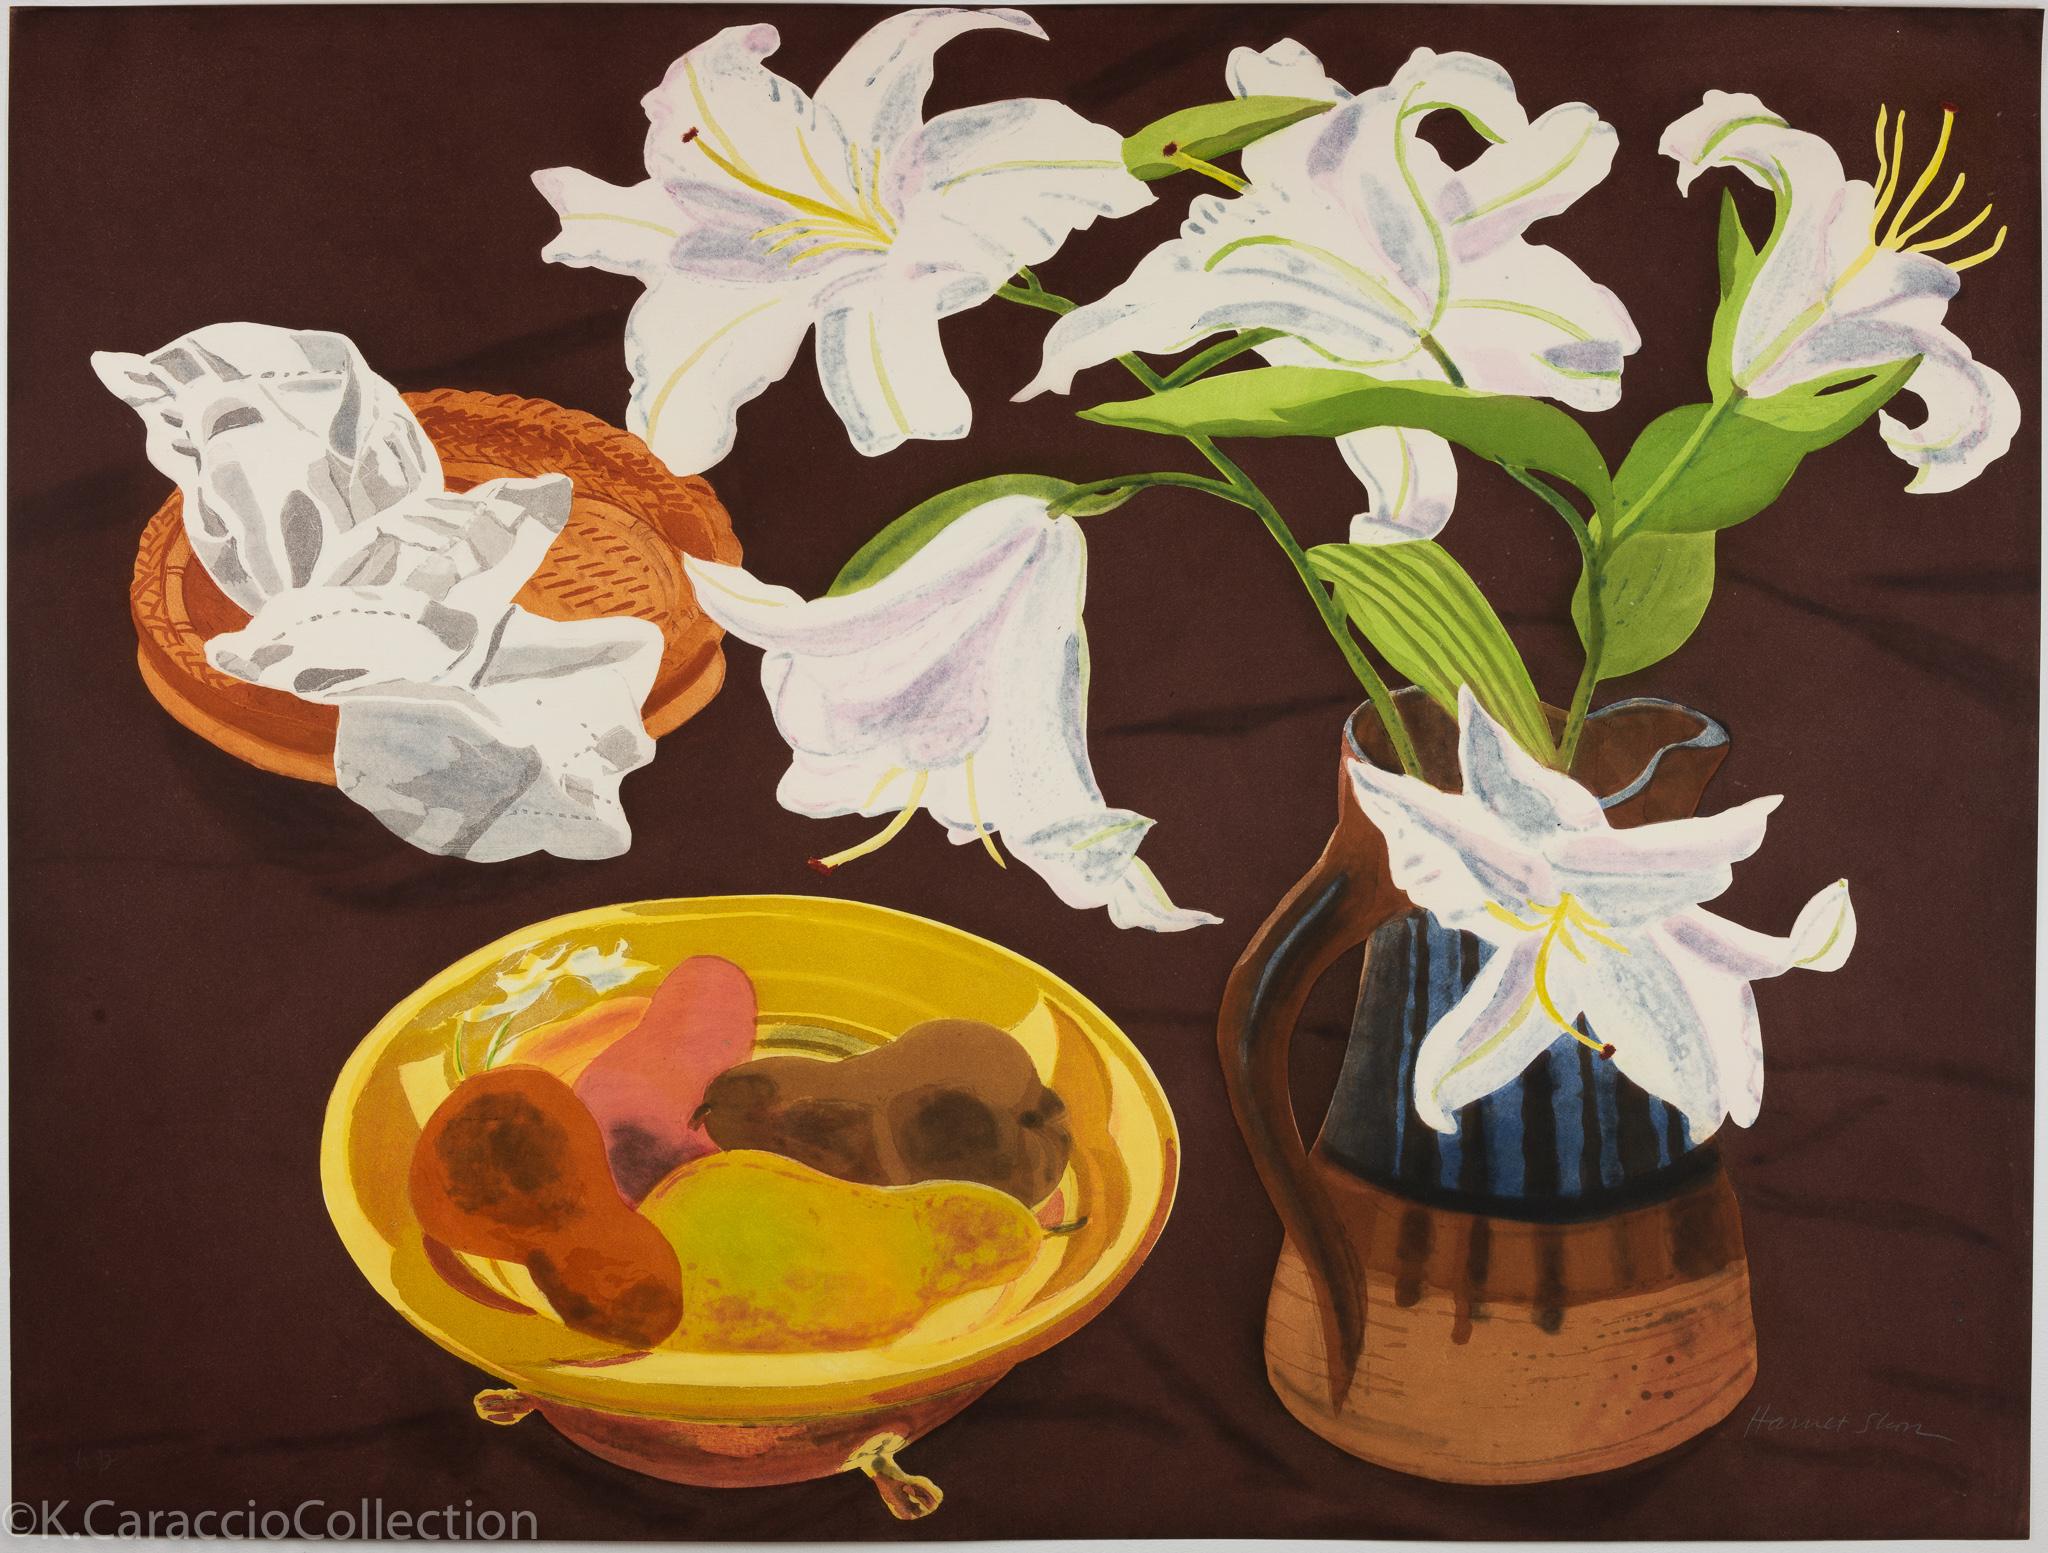 Casblanca Lillies, 1989